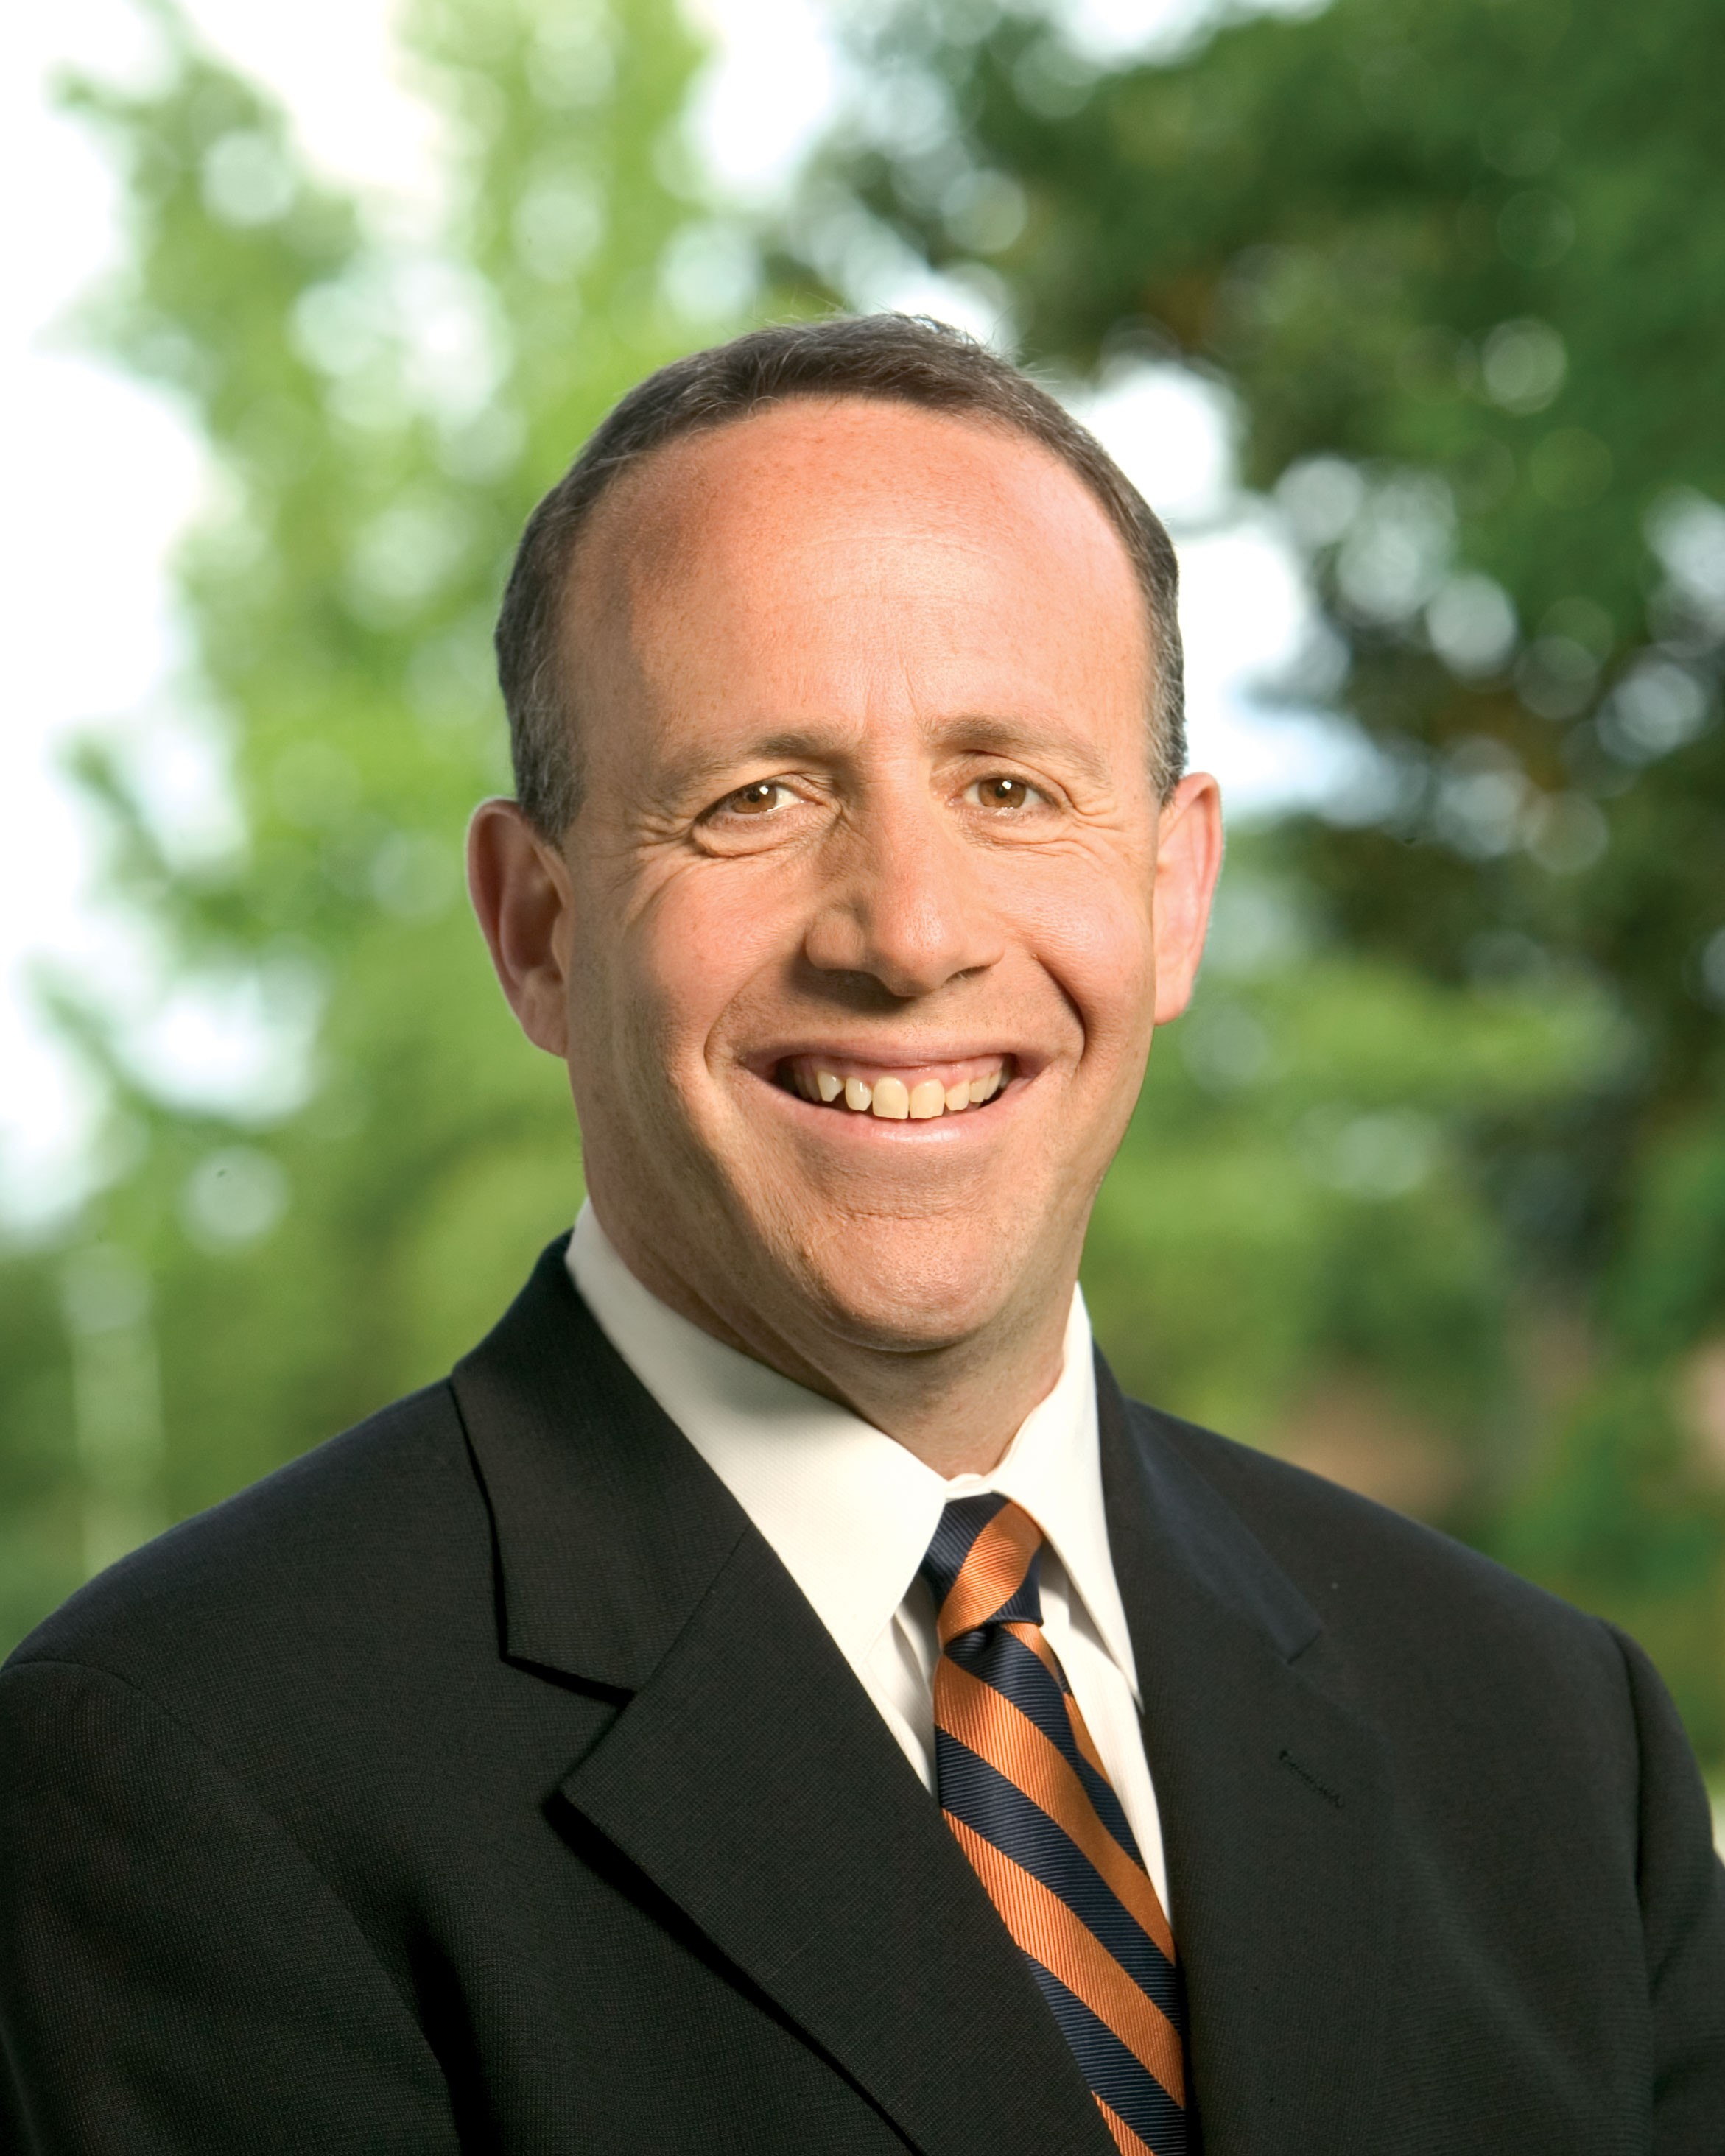 Senator Darrell Steinberg